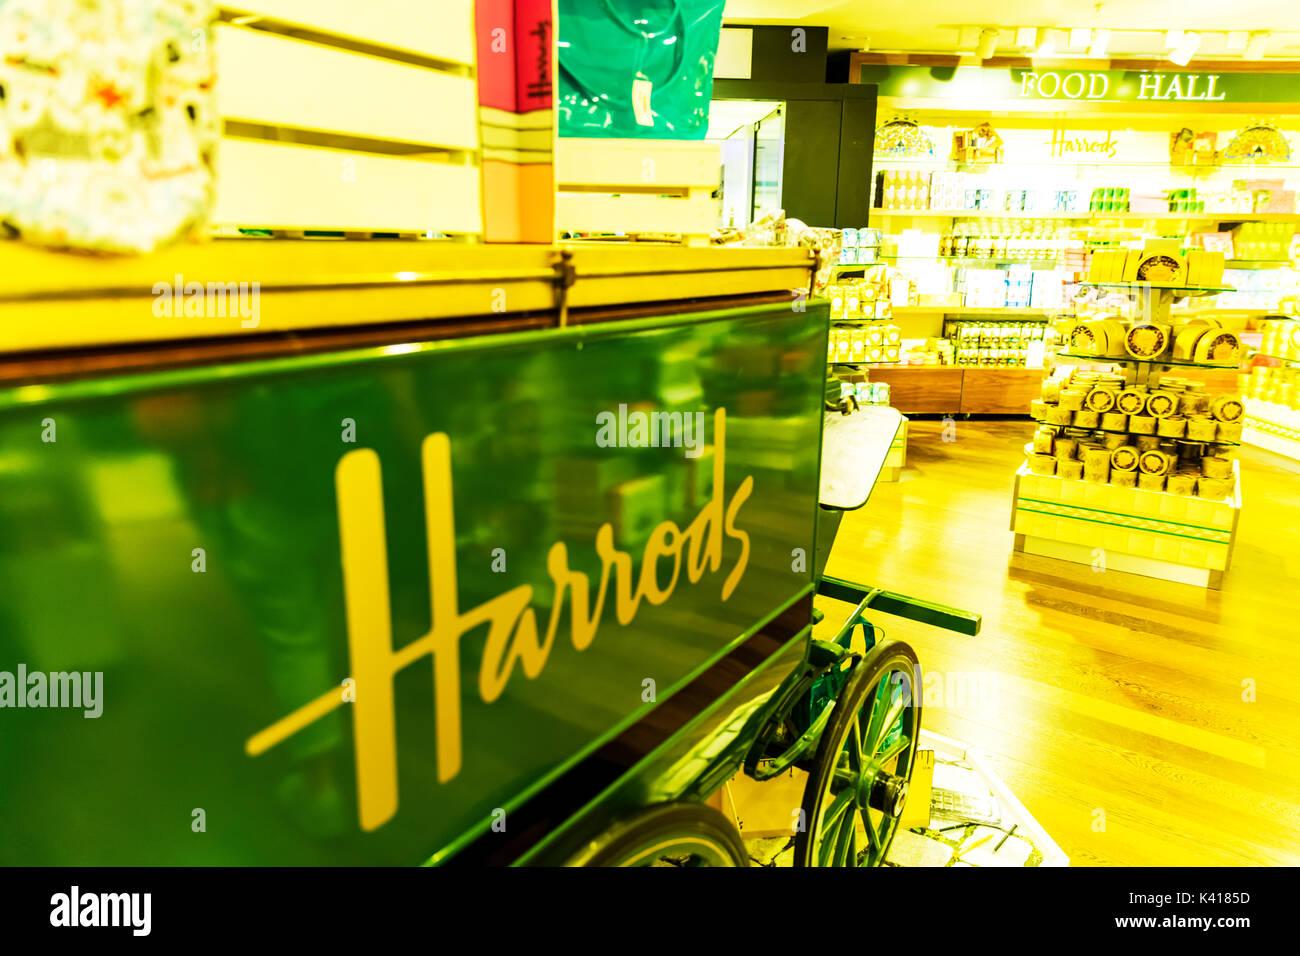 Harrods store, Harrods London UK, Harrods interior, inside Harrods, Harrods Knightsbridge, Harrods London, London department stores, London UK - Stock Image